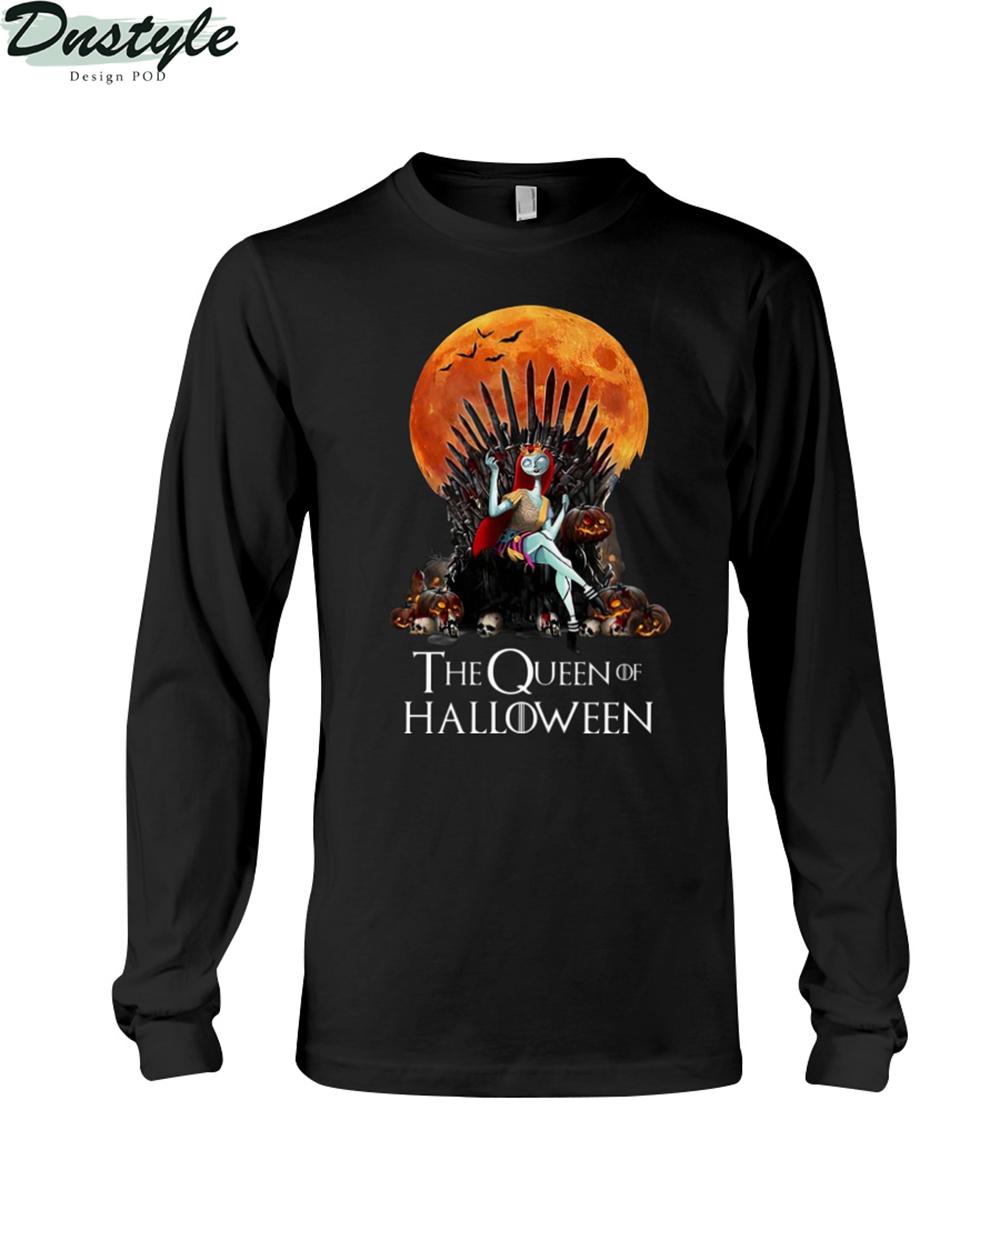 Sally the queen of halloween long sleeve